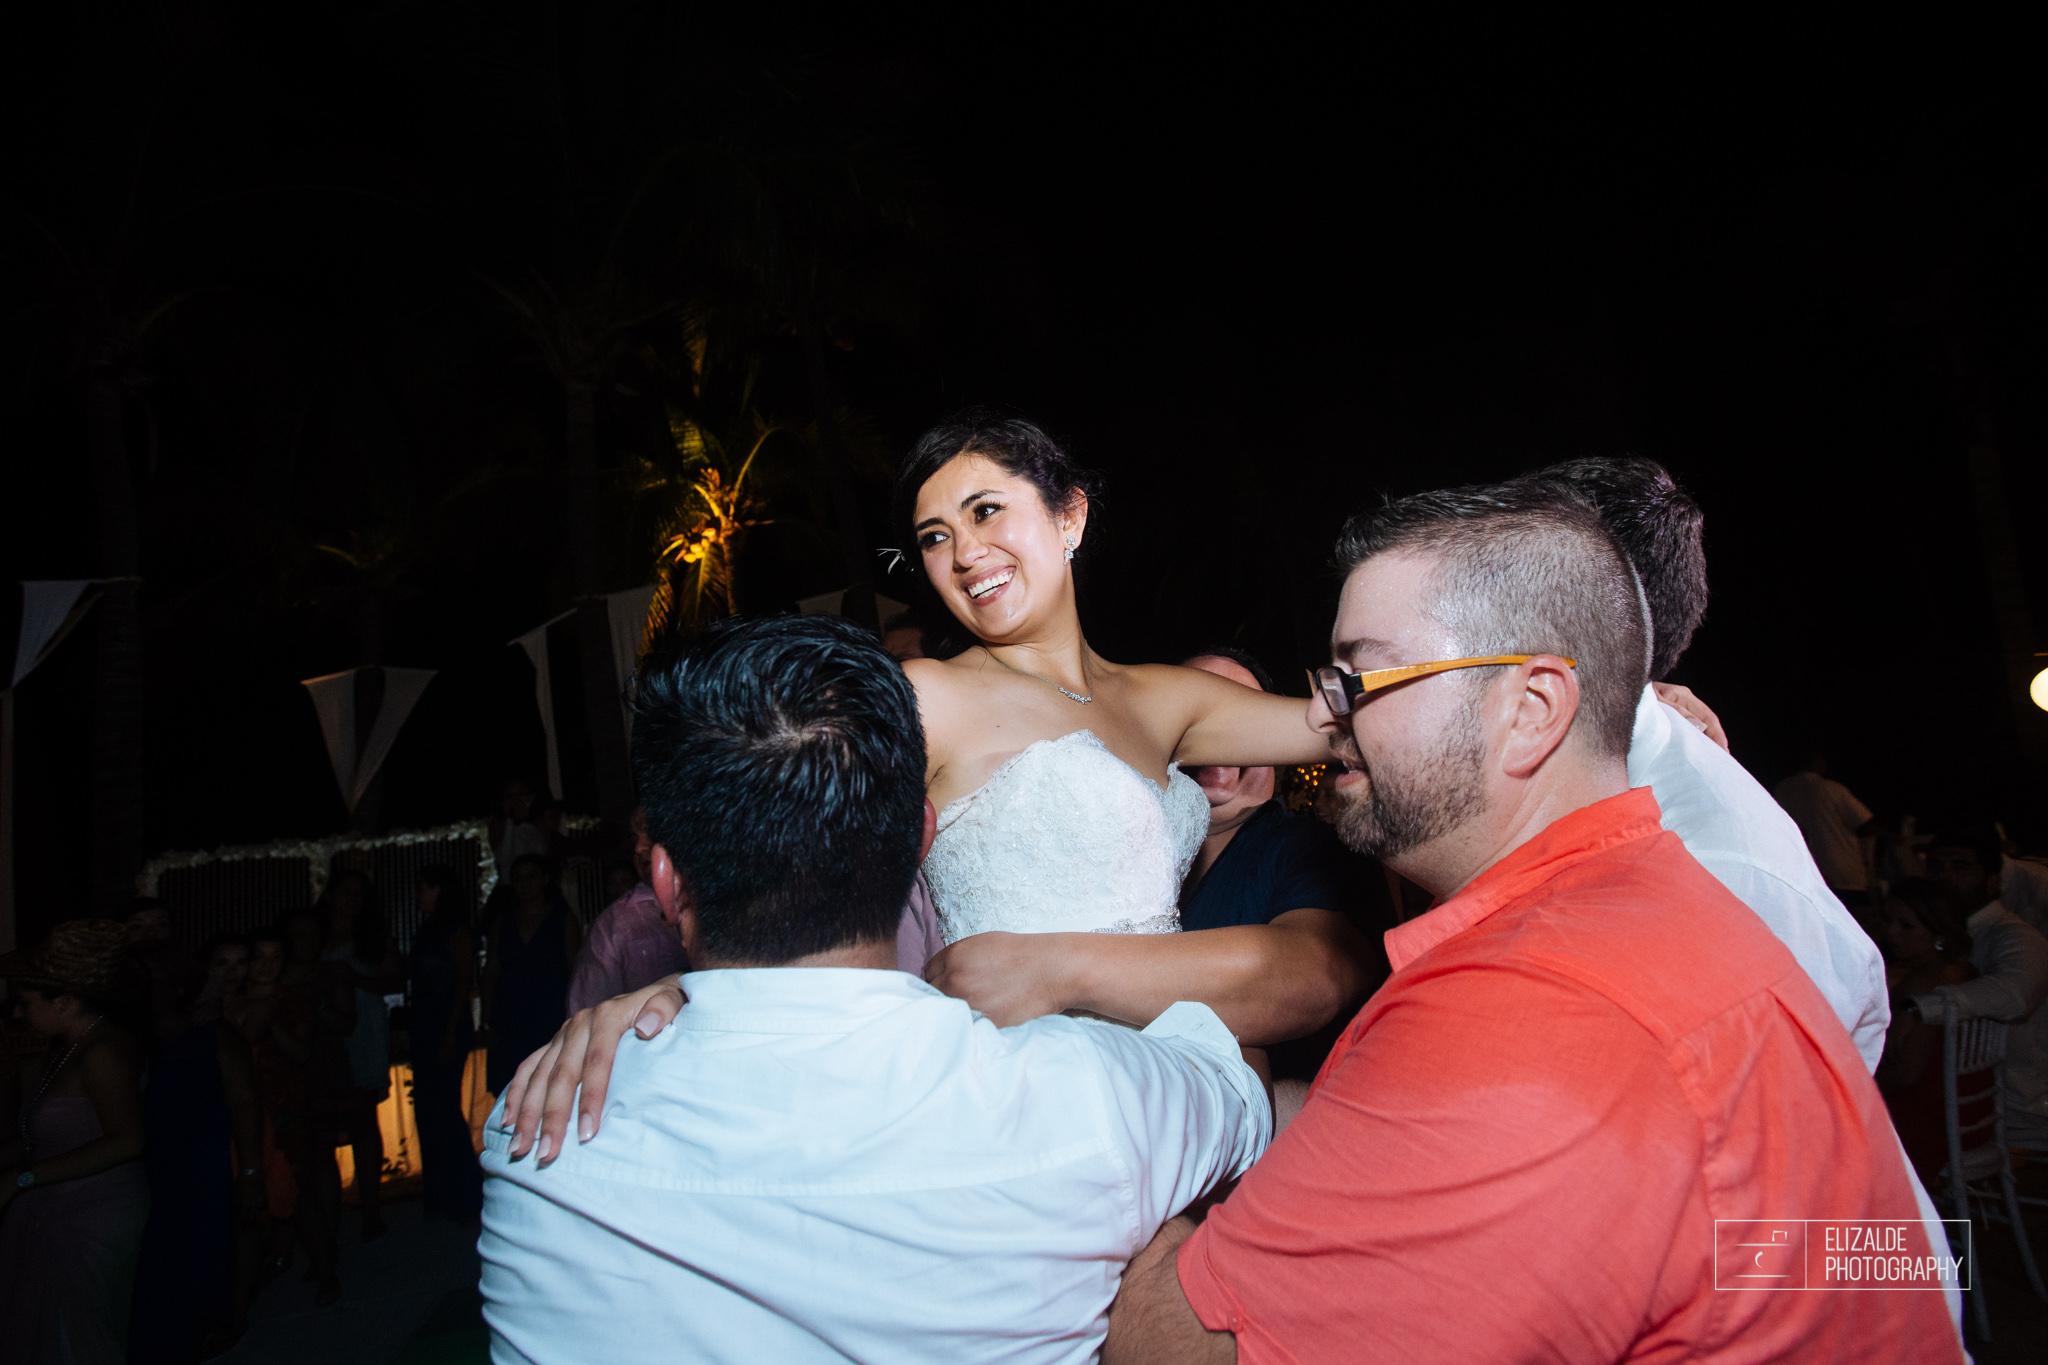 Pay and Ferran_Acapulco_Destination Wedding_Elizalde Photography-171.jpg